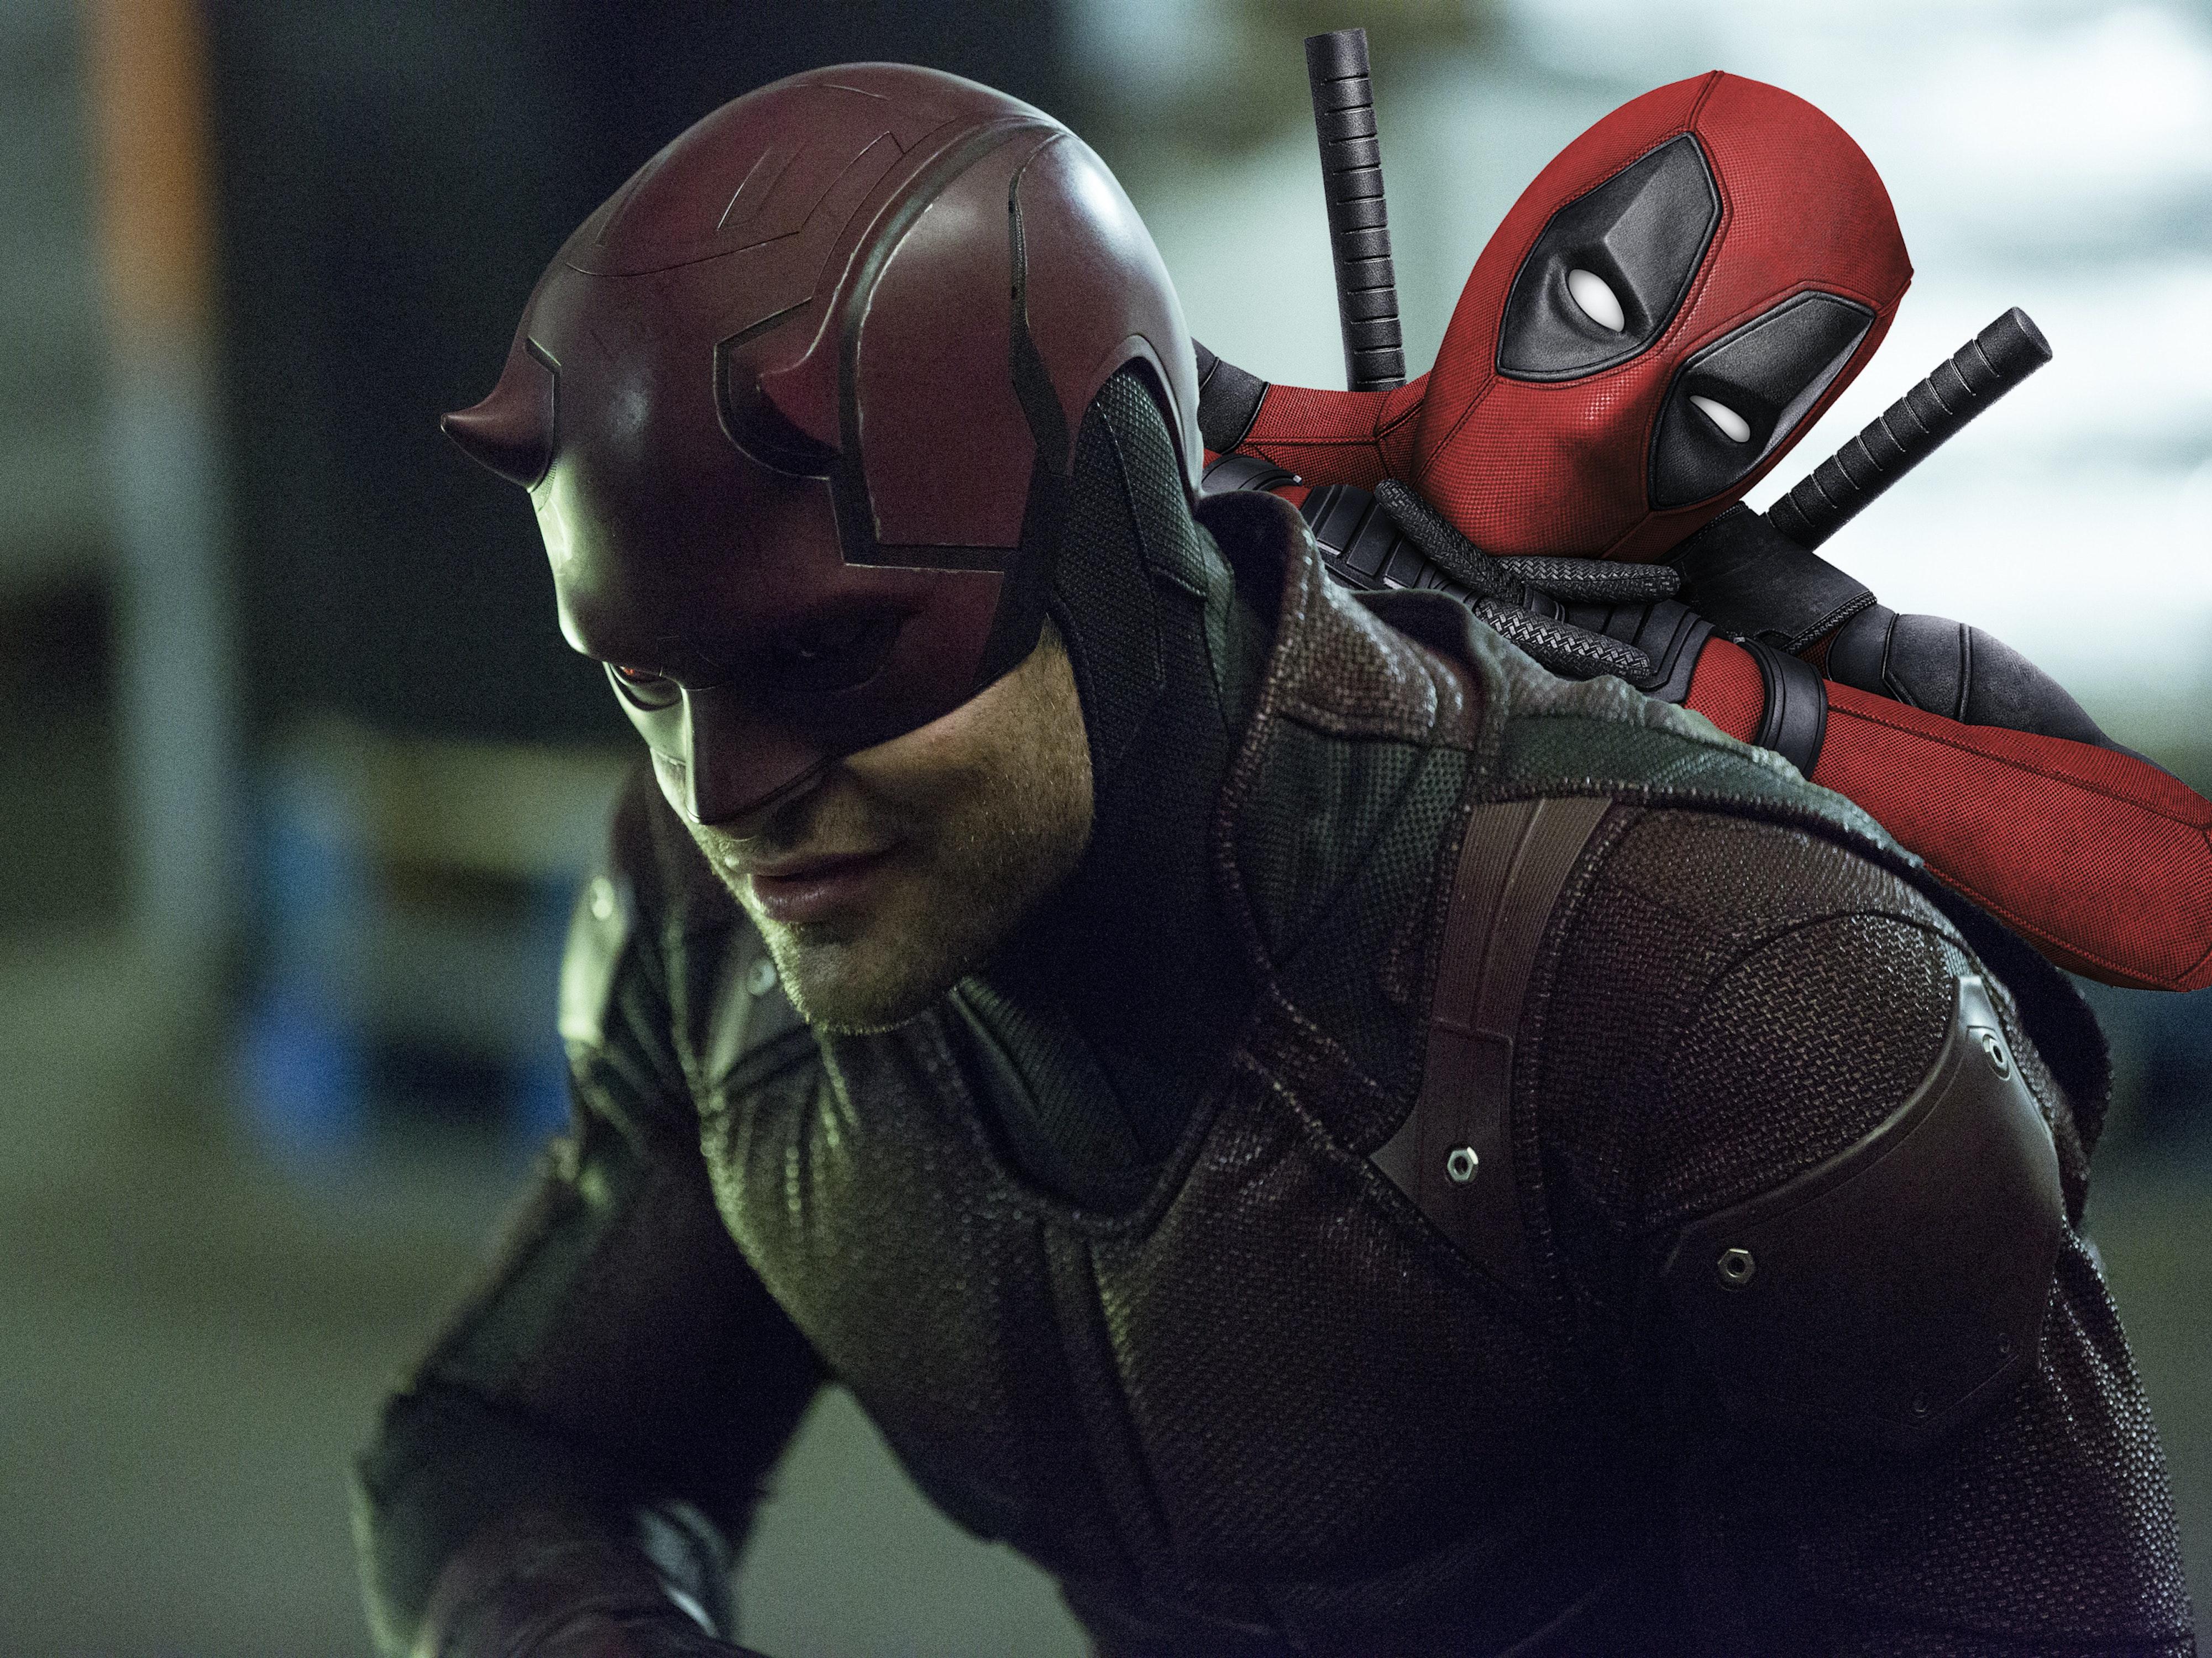 'Deadpool 2' Invites 'Daredevil' Writer to Punch Up Script